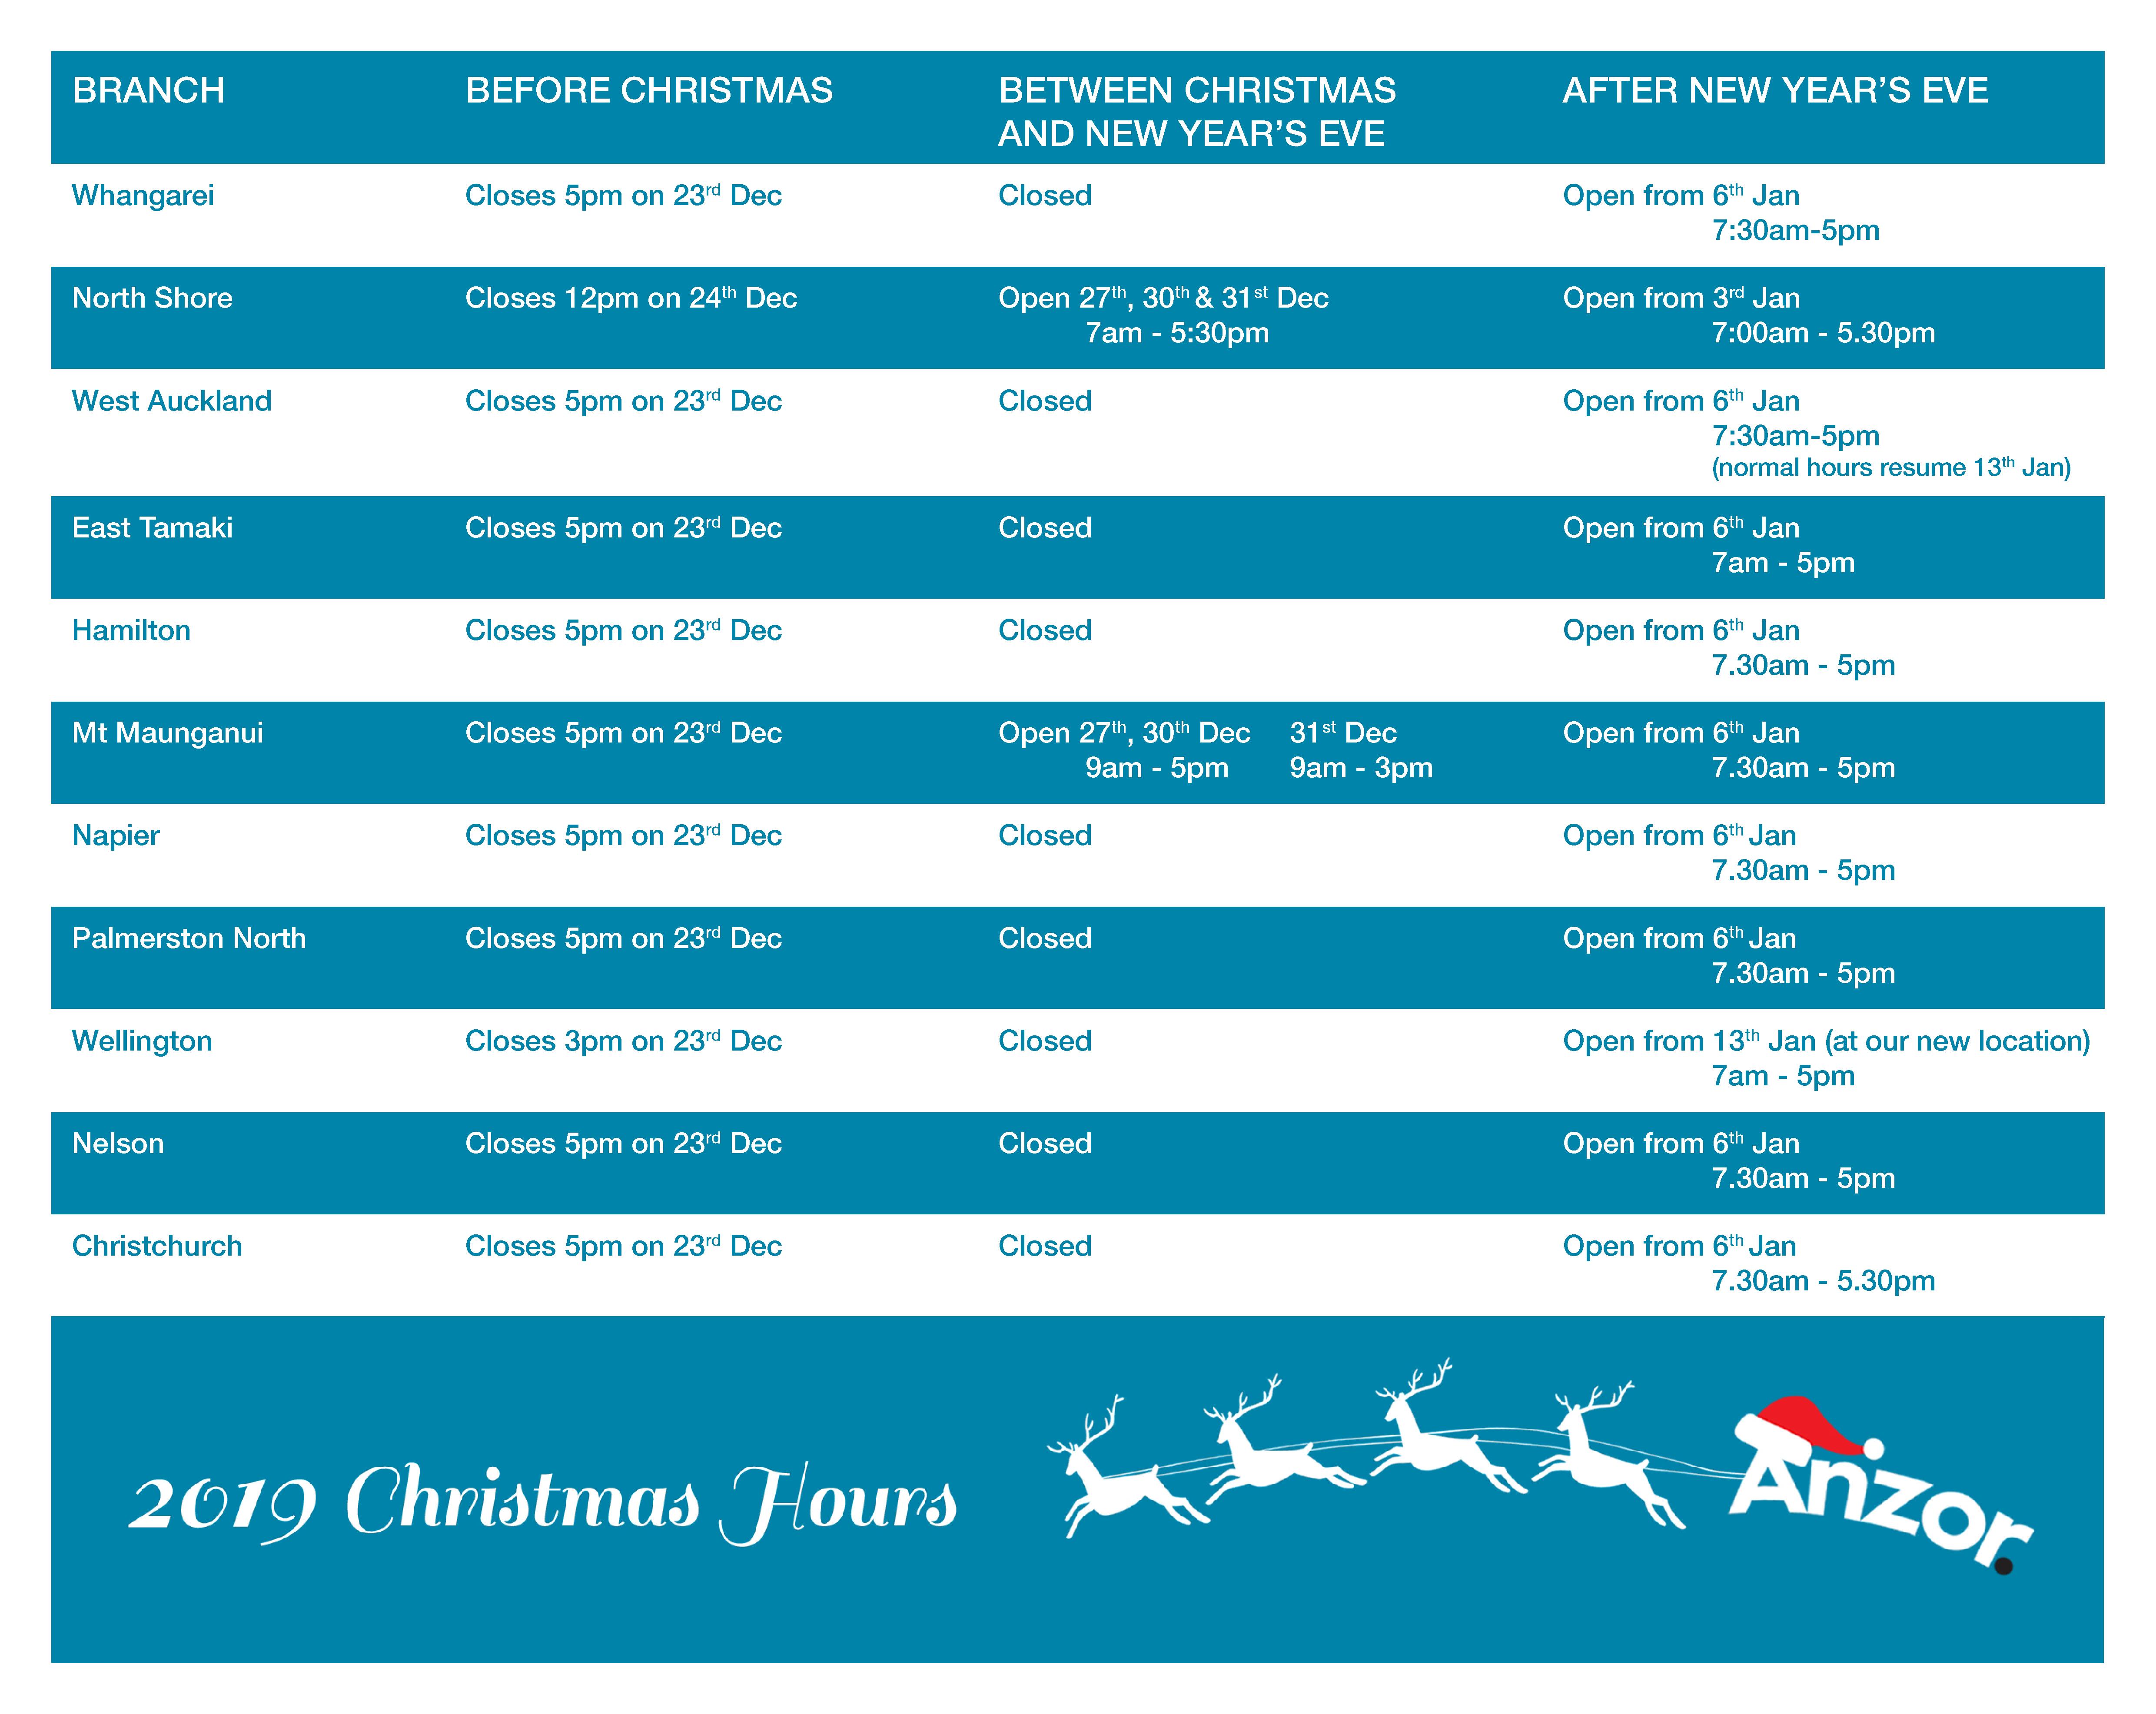 2019-2020 Anzor Christmas Hours